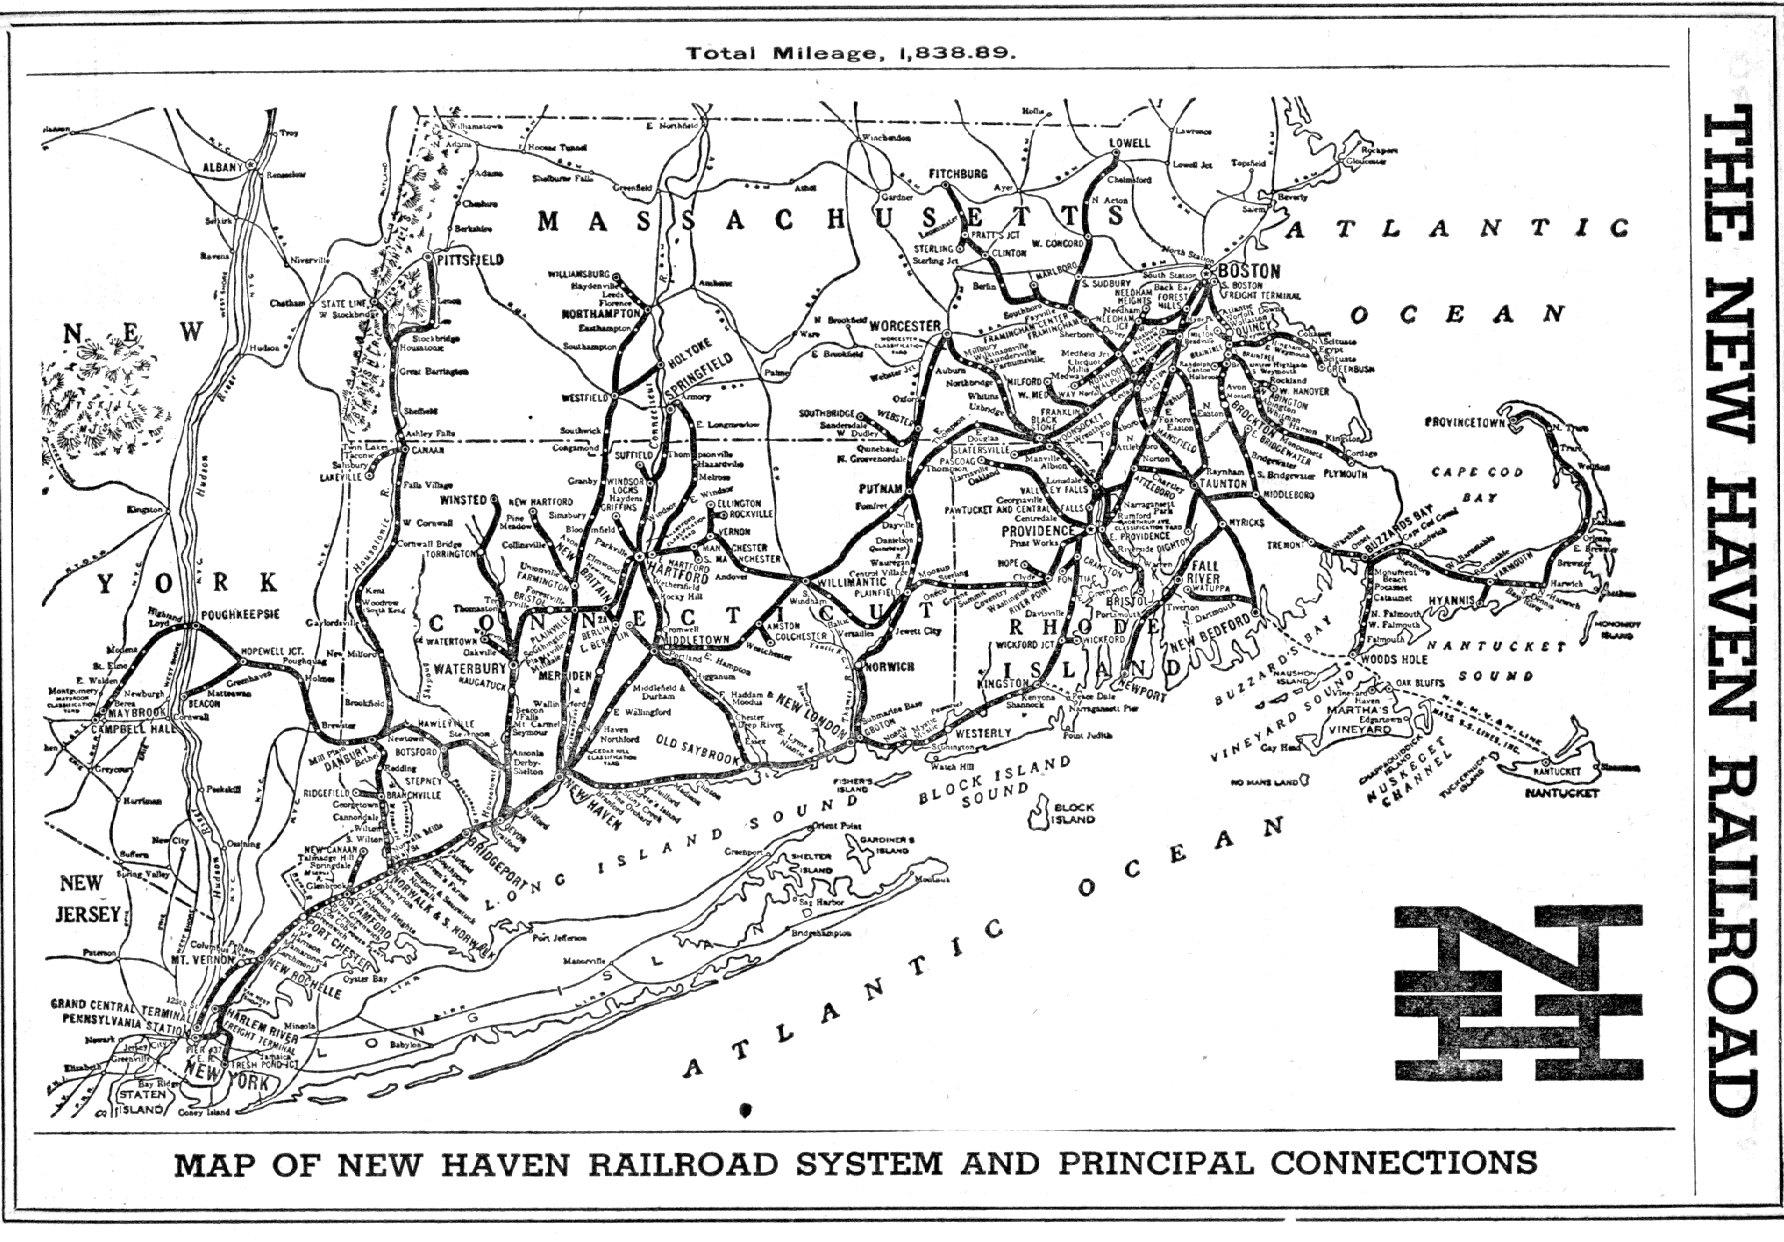 Fantasy Map Passenger Rail System For Connecticut